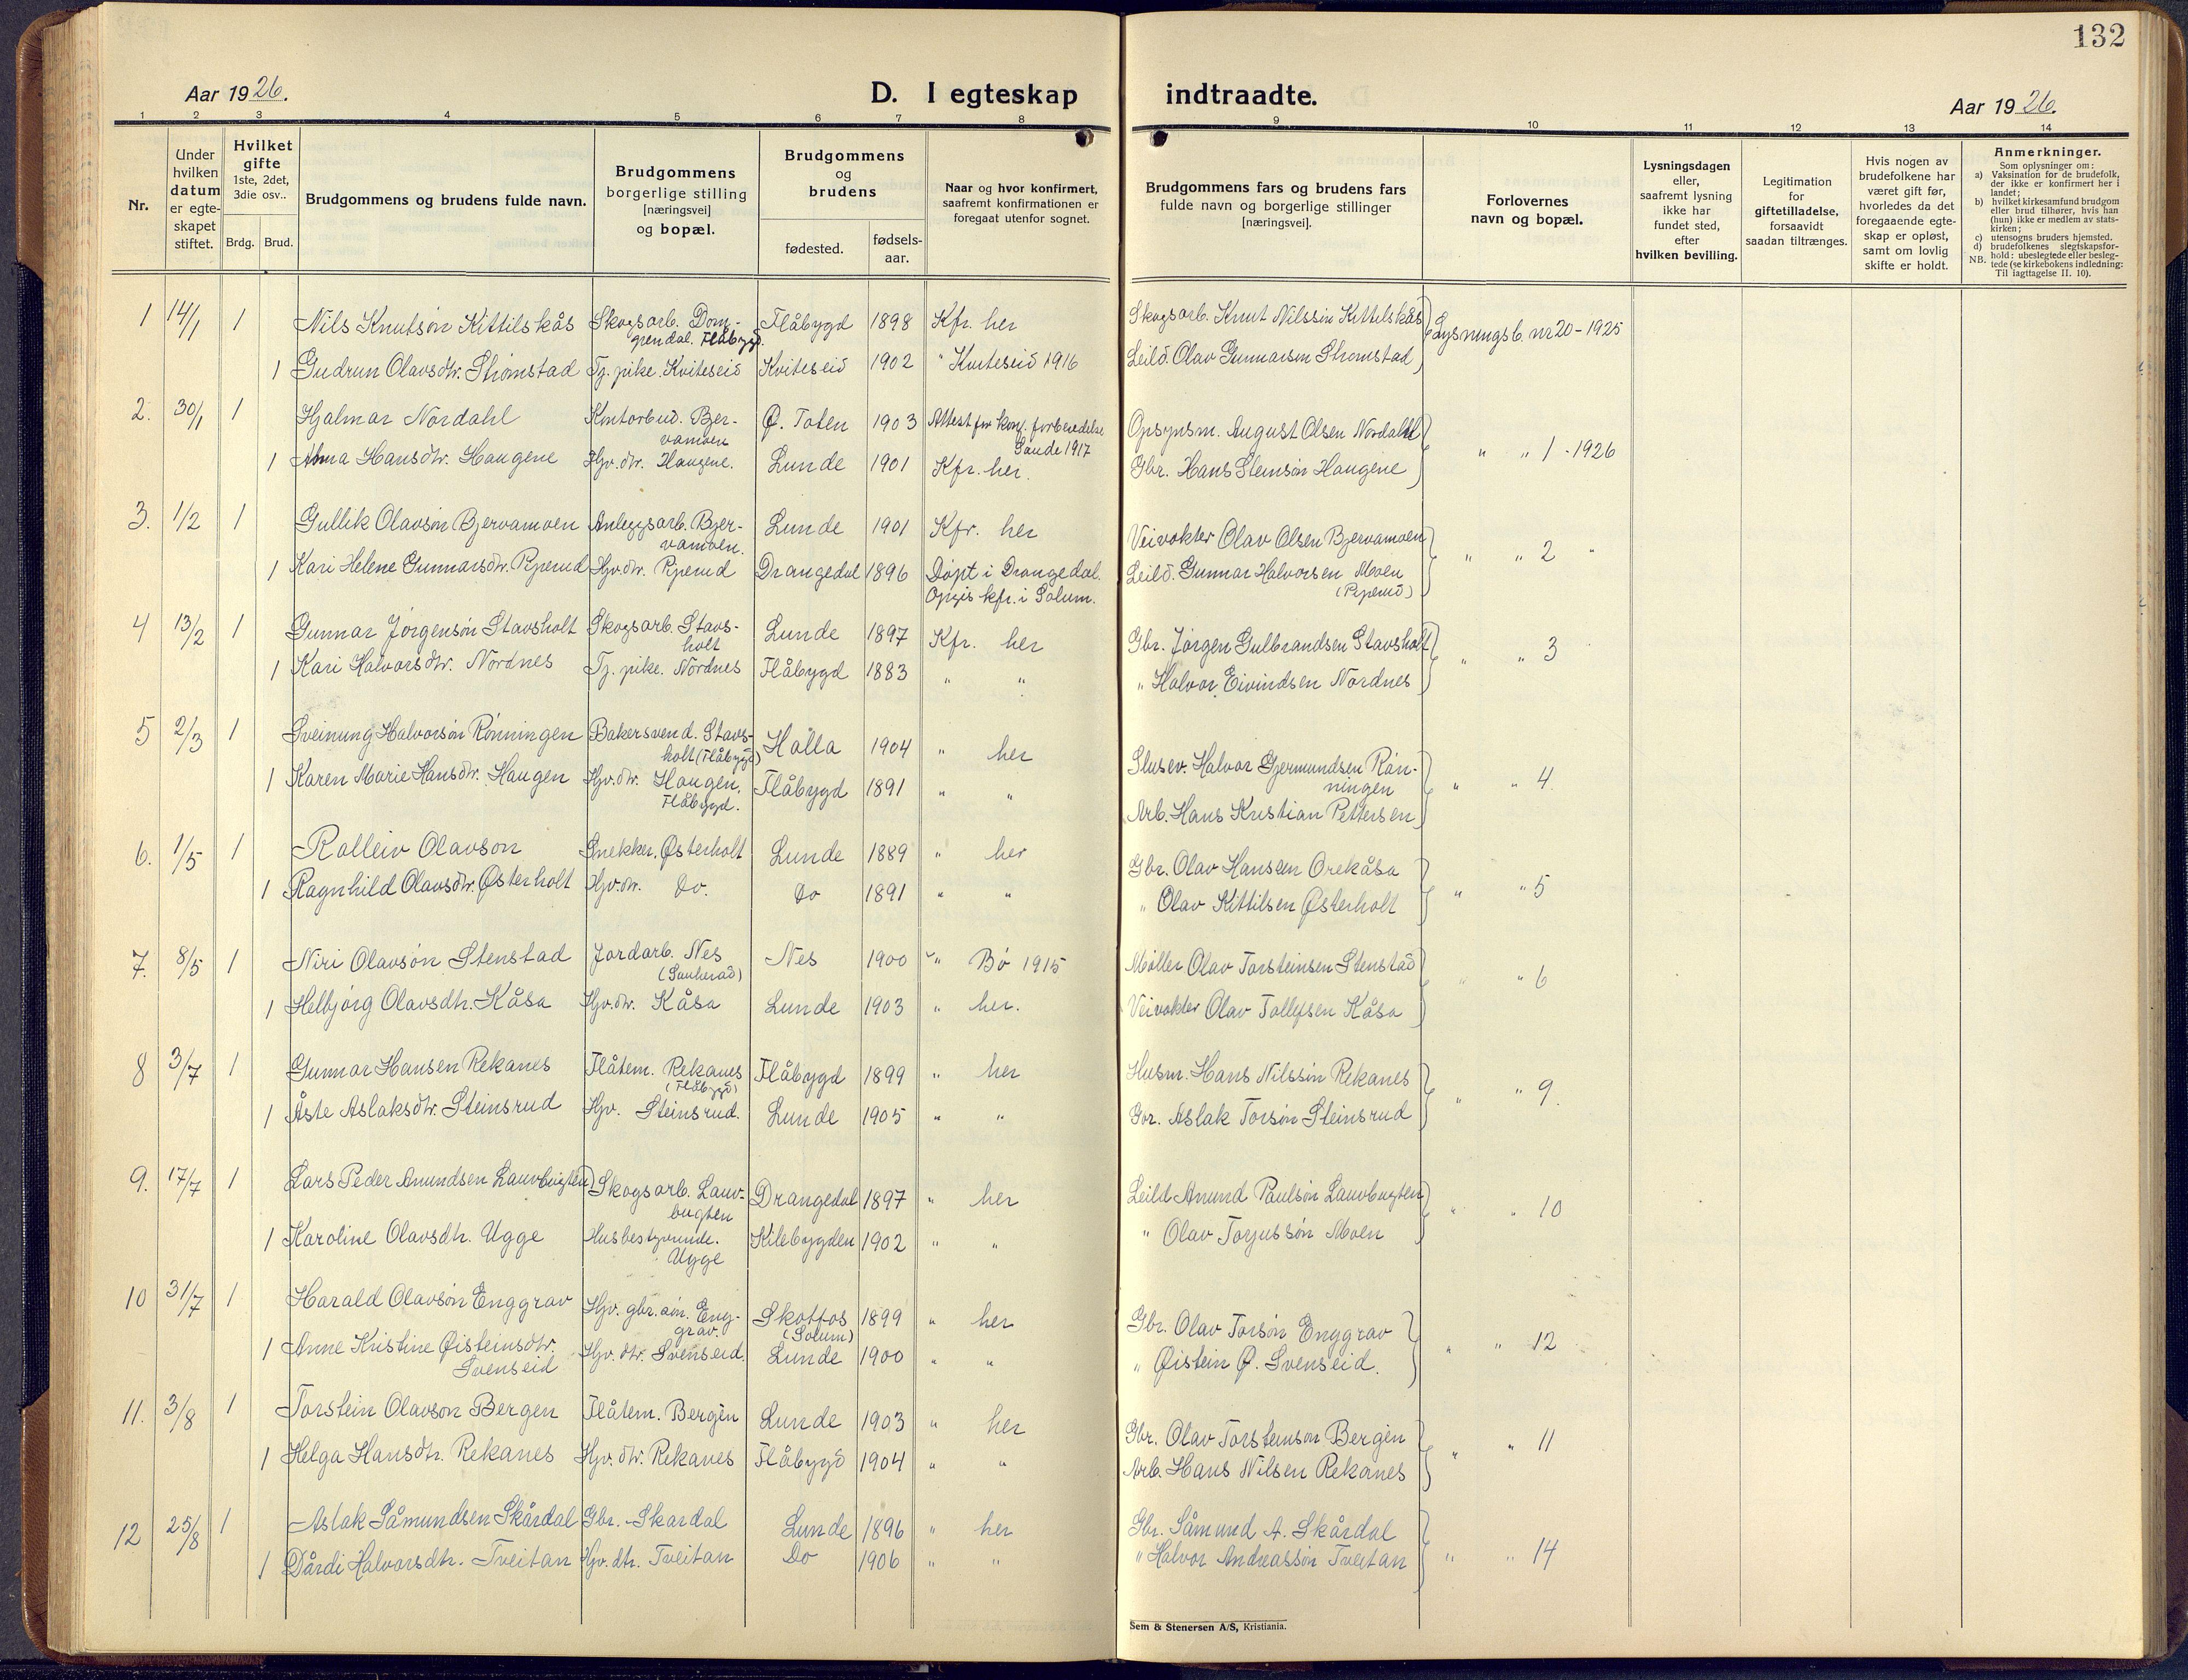 SAKO, Lunde kirkebøker, F/Fa/L0006: Ministerialbok nr. I 6, 1922-1940, s. 132